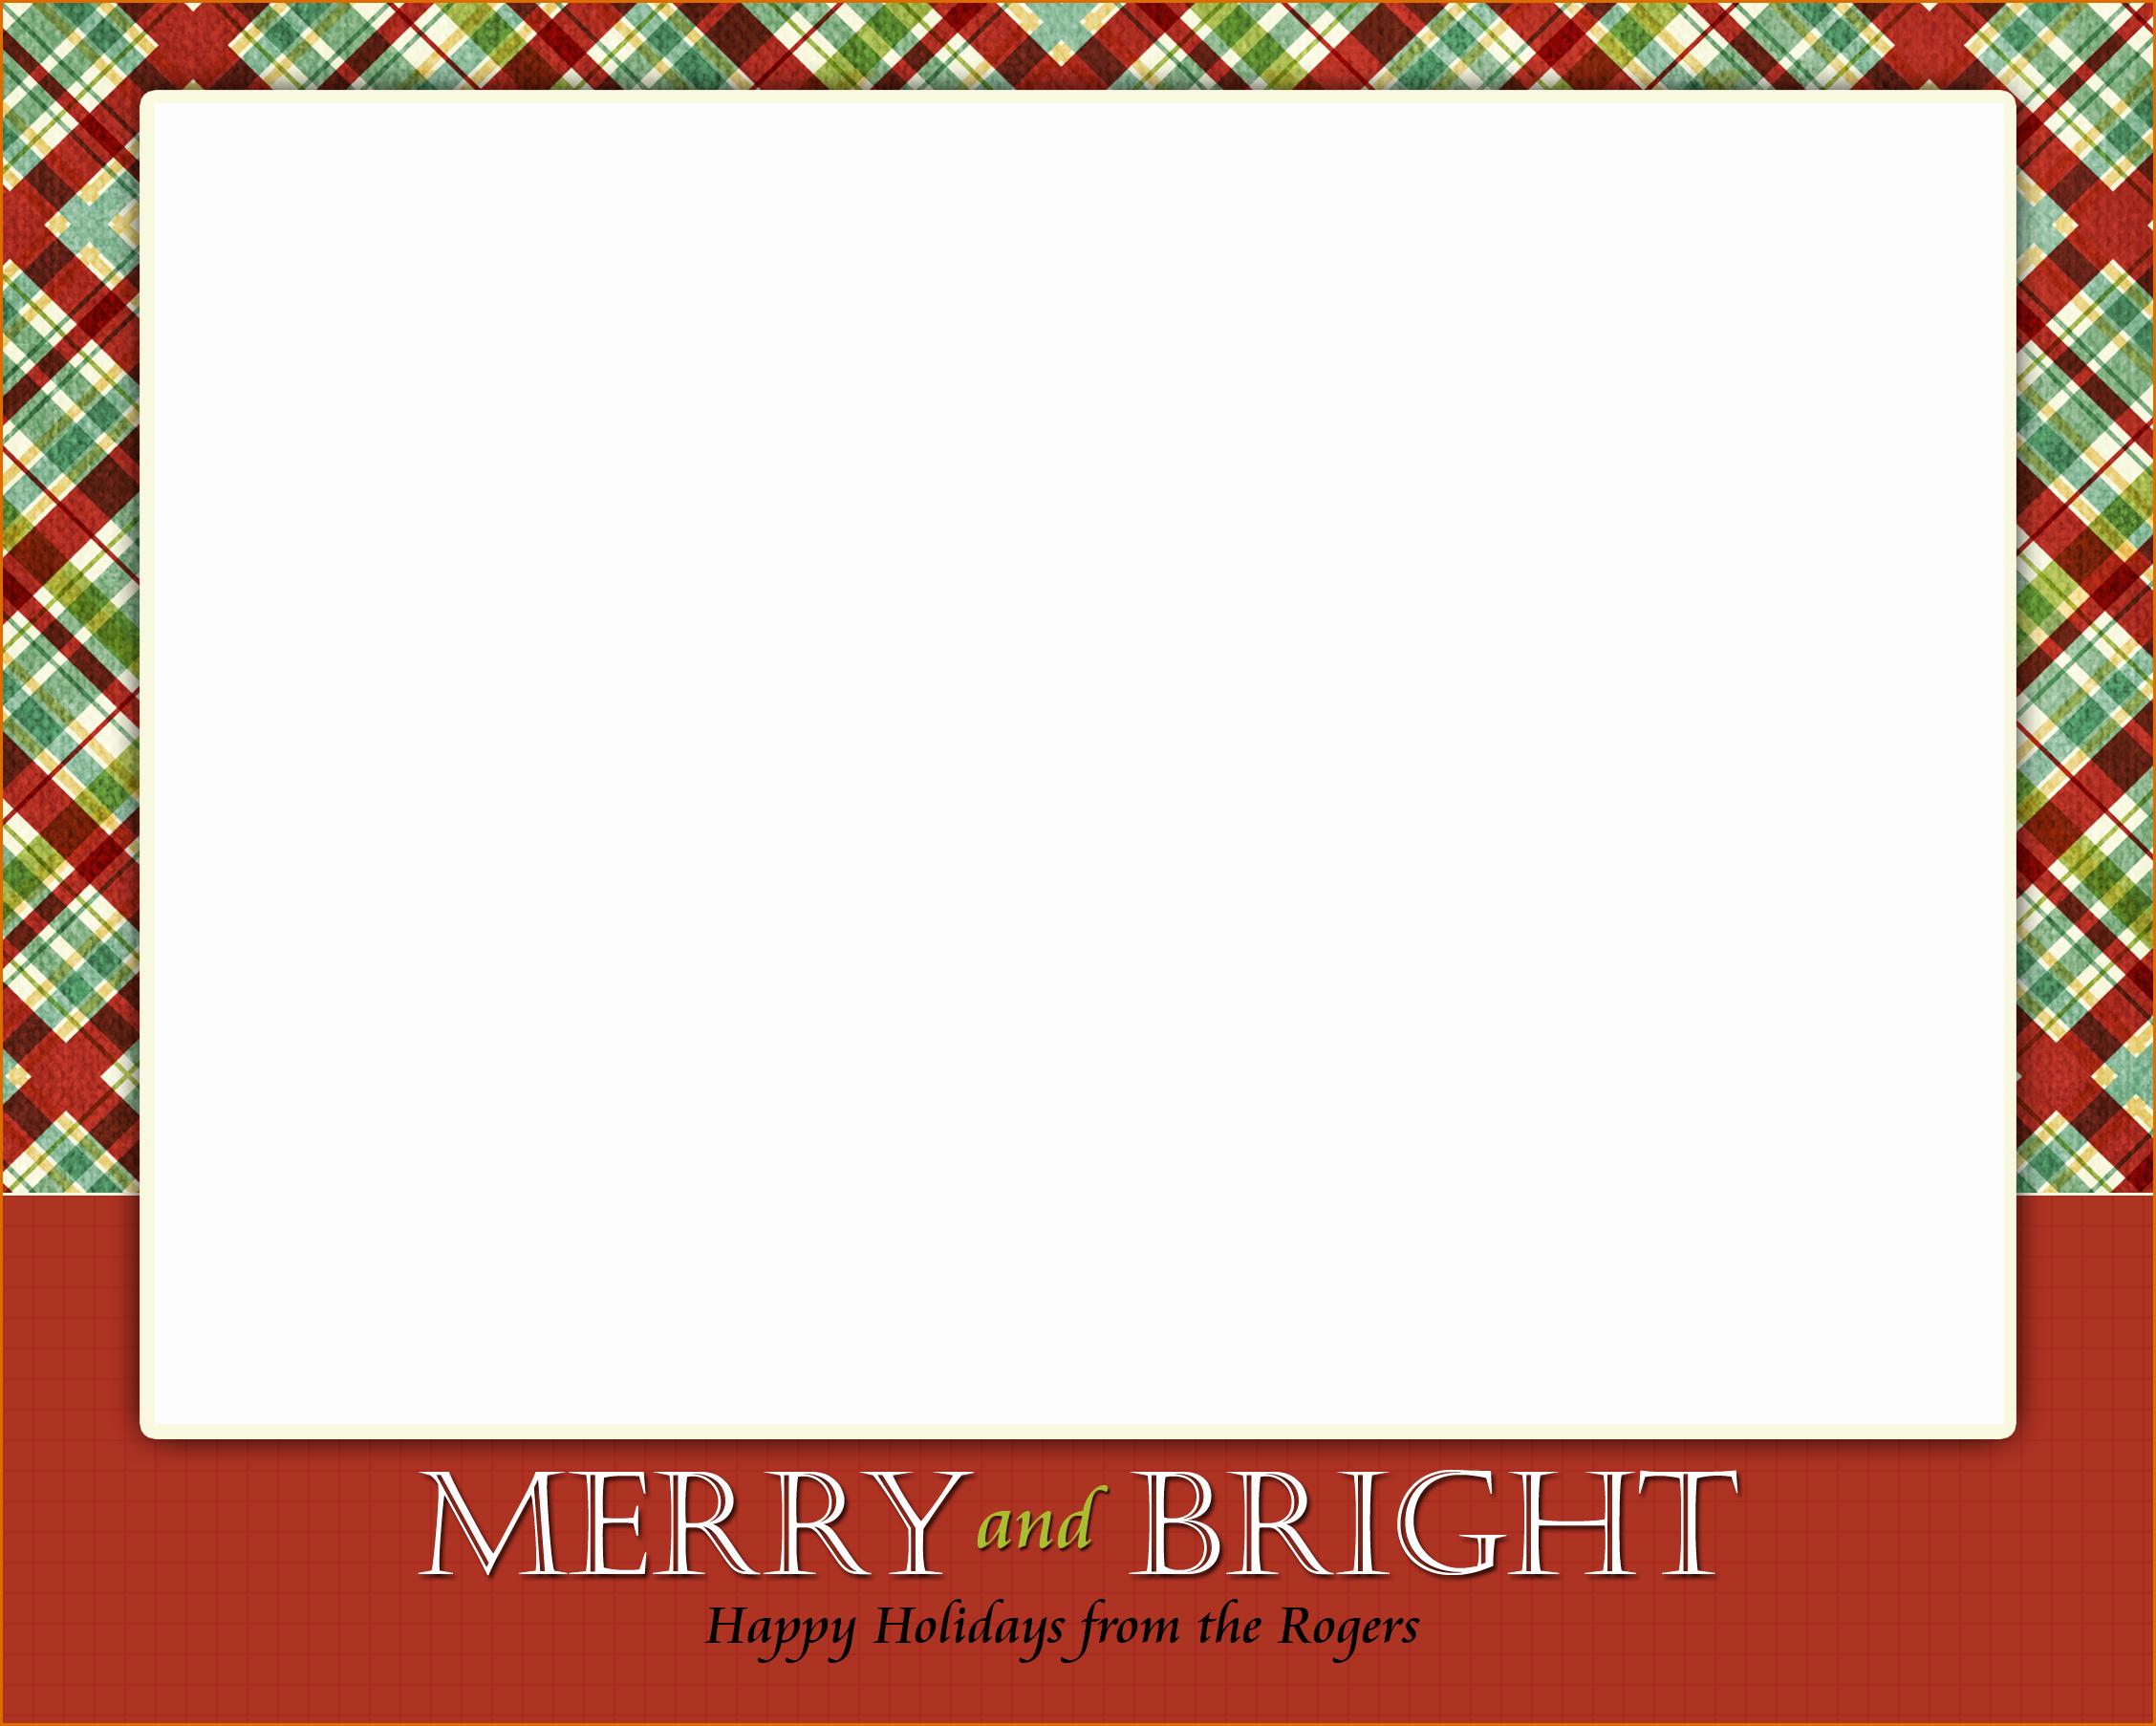 Microsoft Word Christmas Card Templates Beautiful 12 Free Christmas Templates for Word